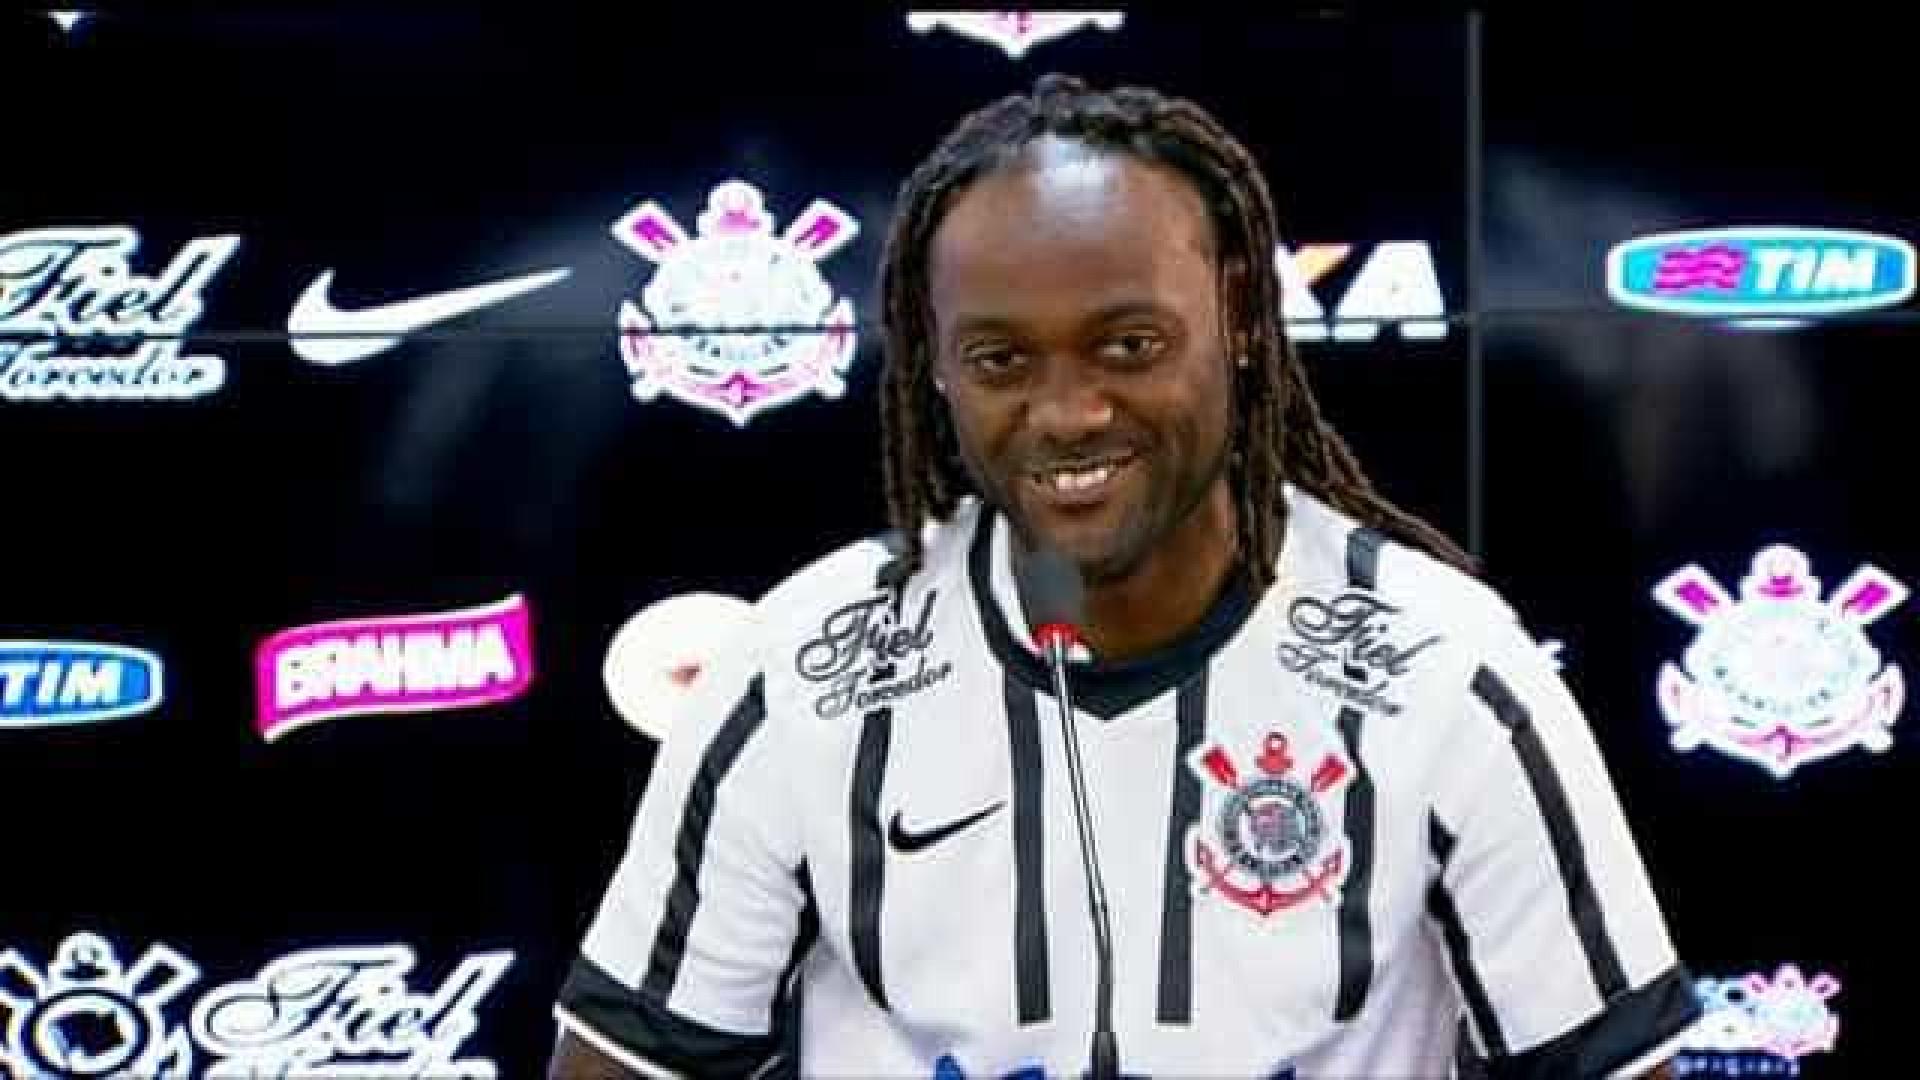 Vagner Love comemora boa fase no Corinthians e faz desabafo